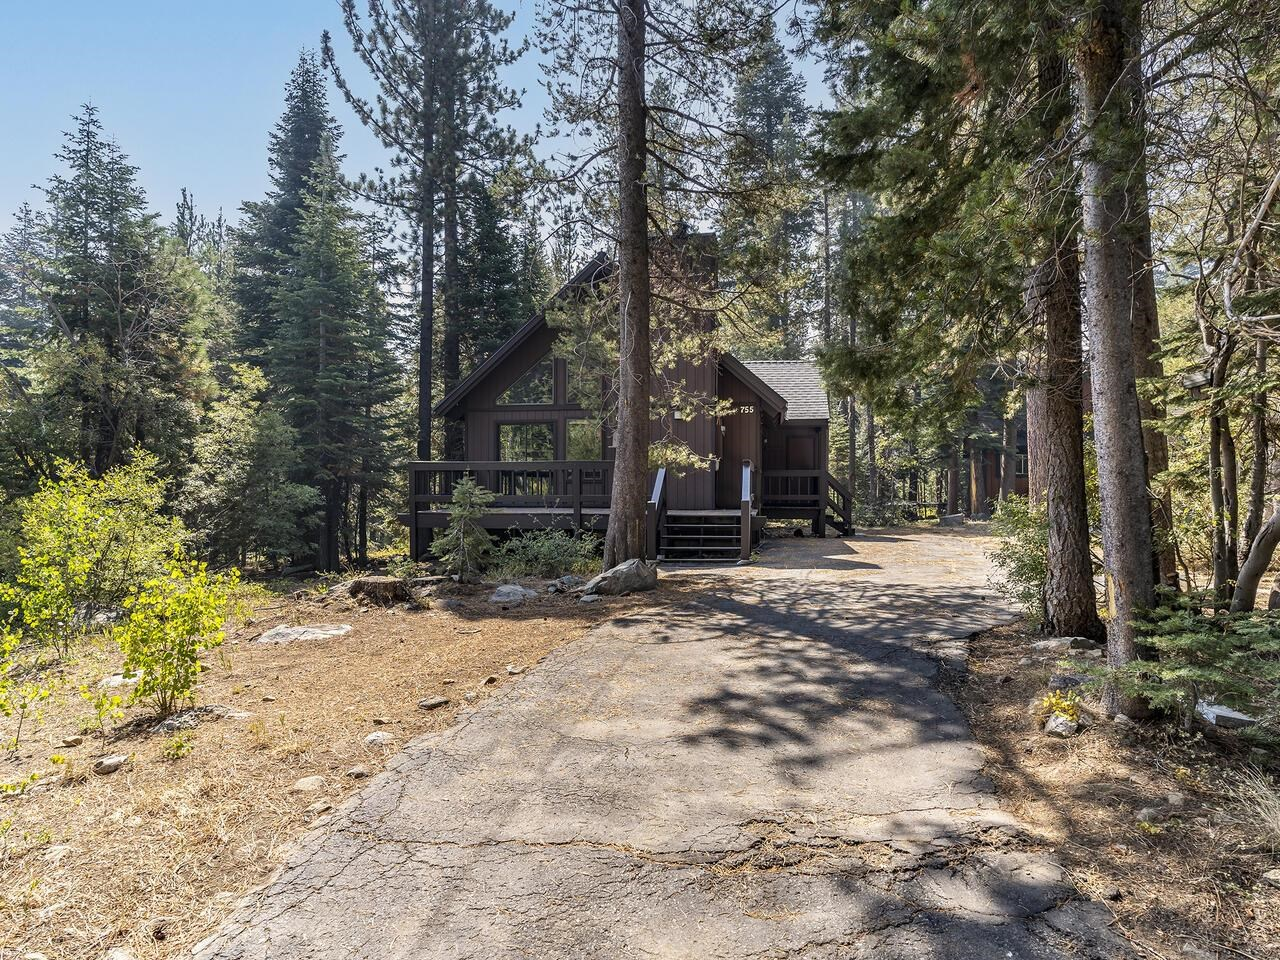 755 McKinney Creek Road, Homewood, CA 96141